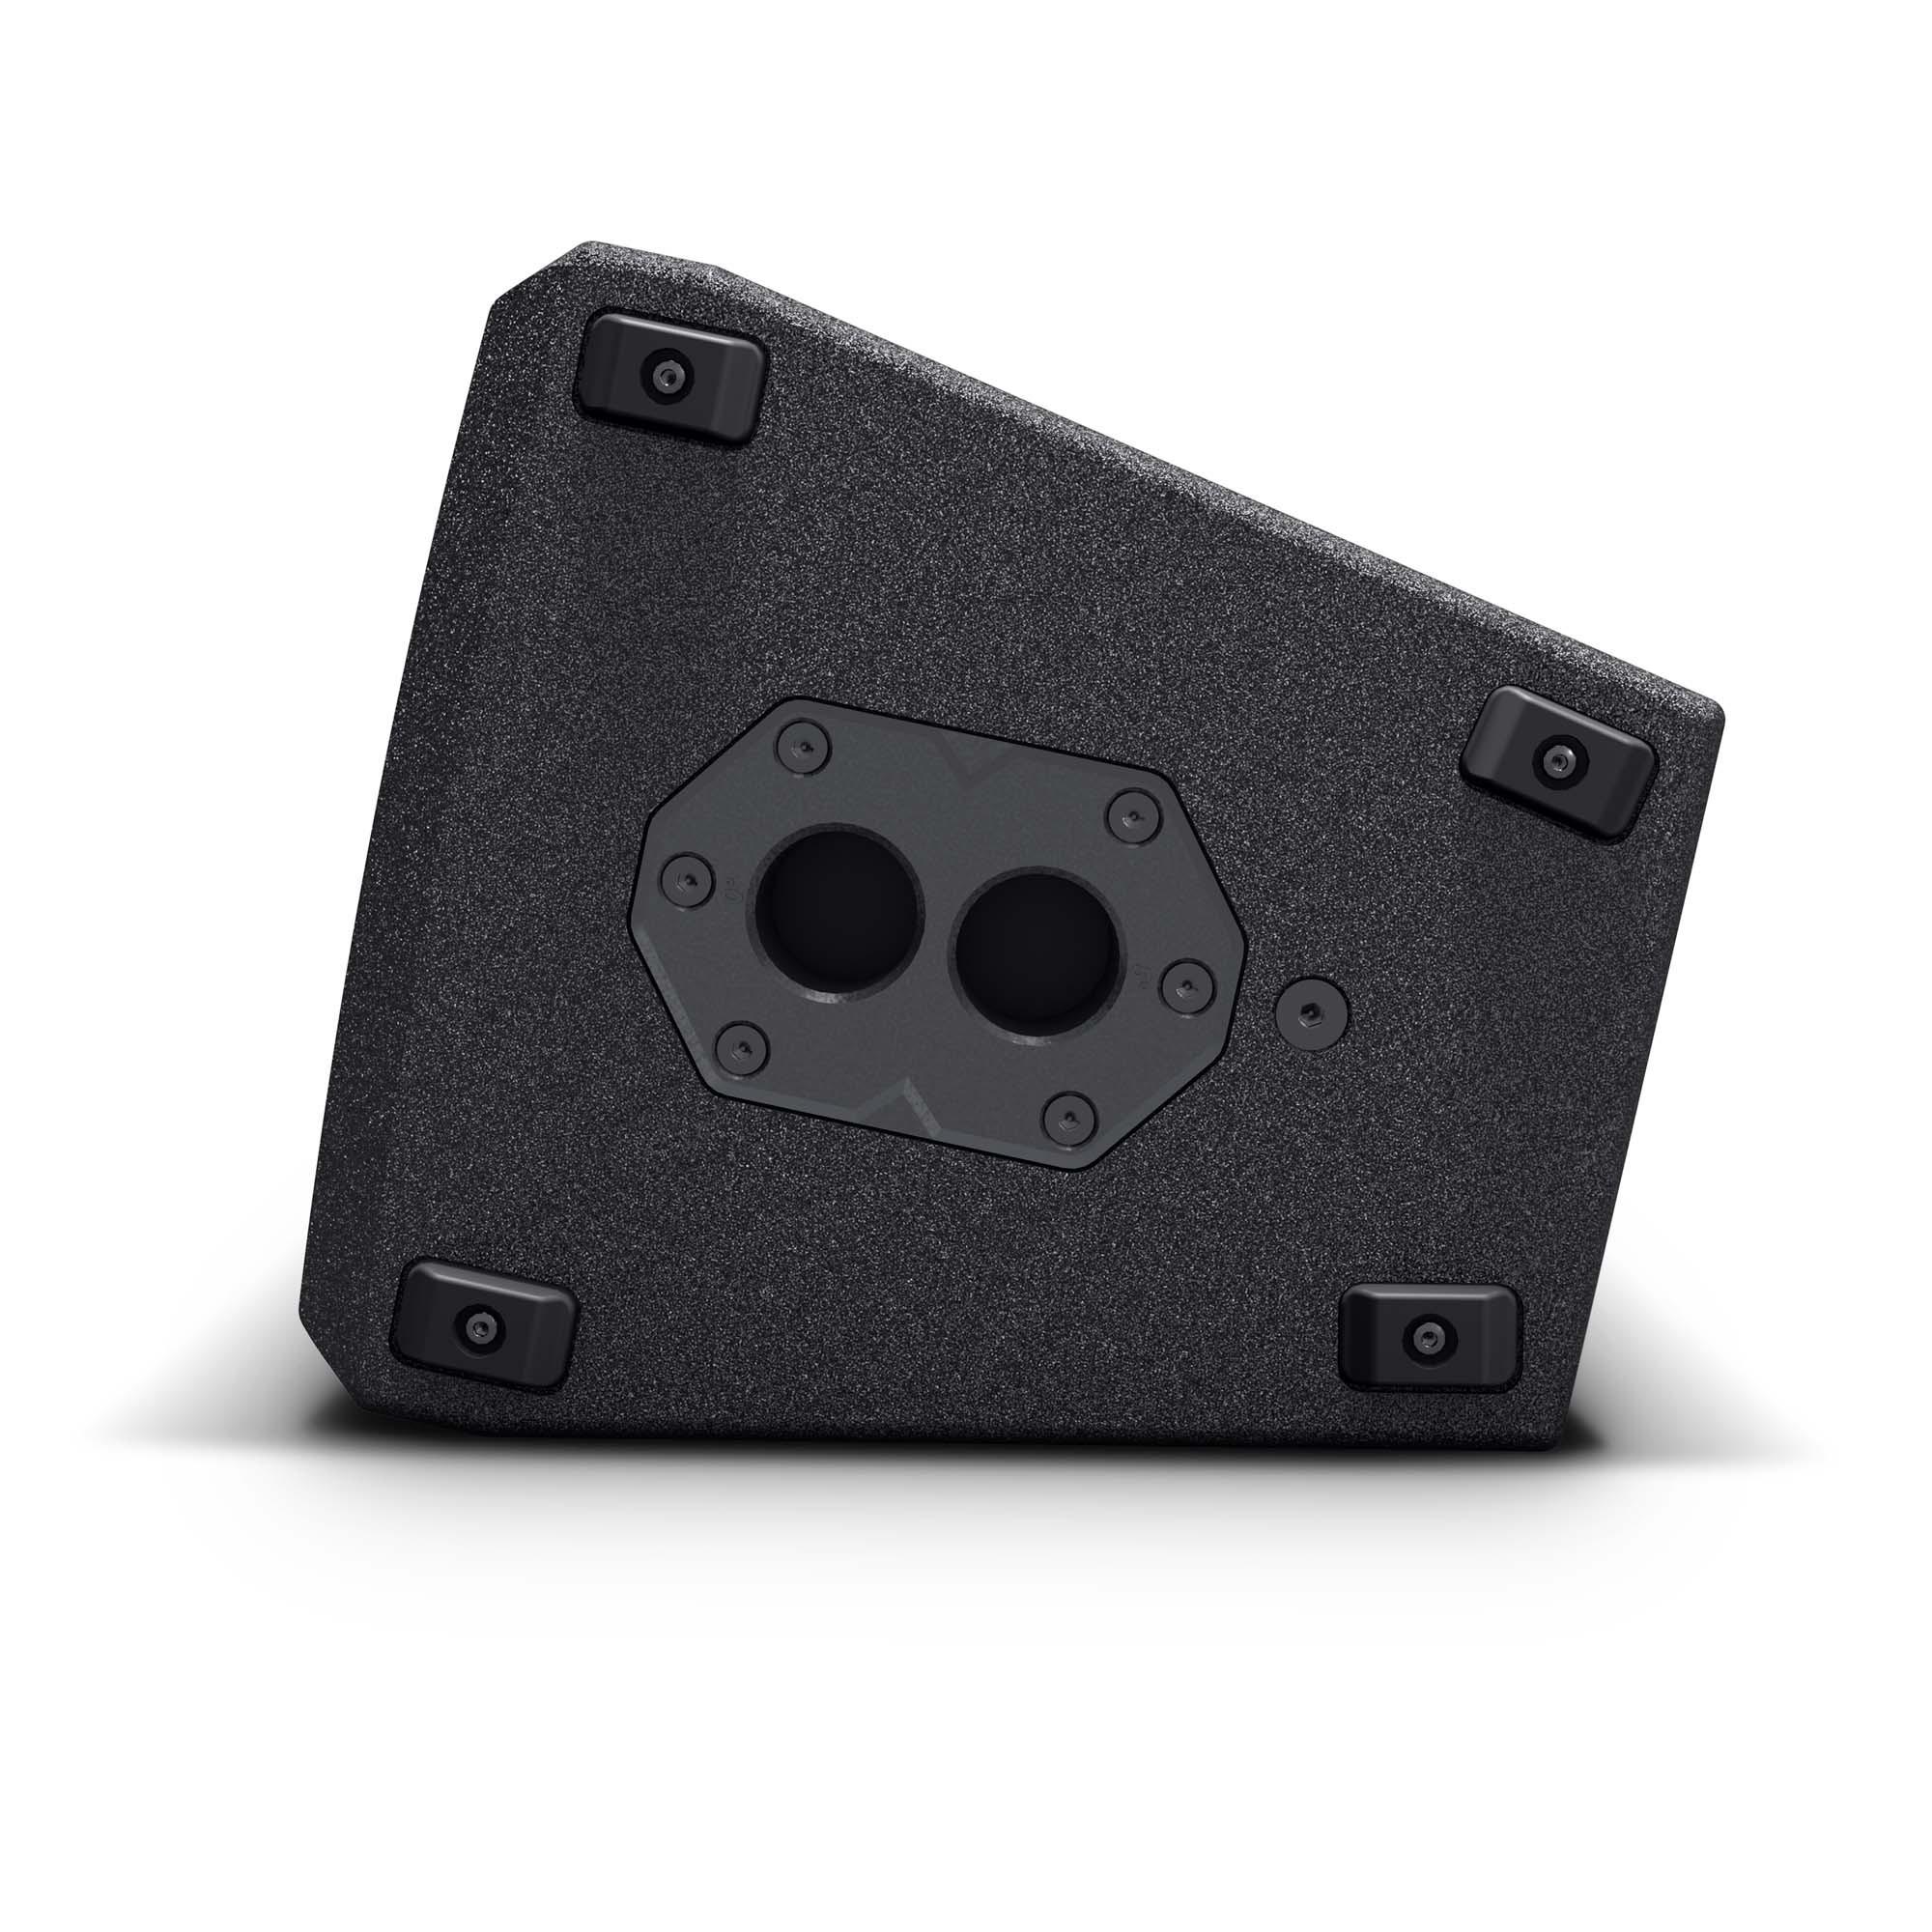 "STINGER 28 A G3 Active 2 x 8"" 2-way bass-reflex PA speaker"